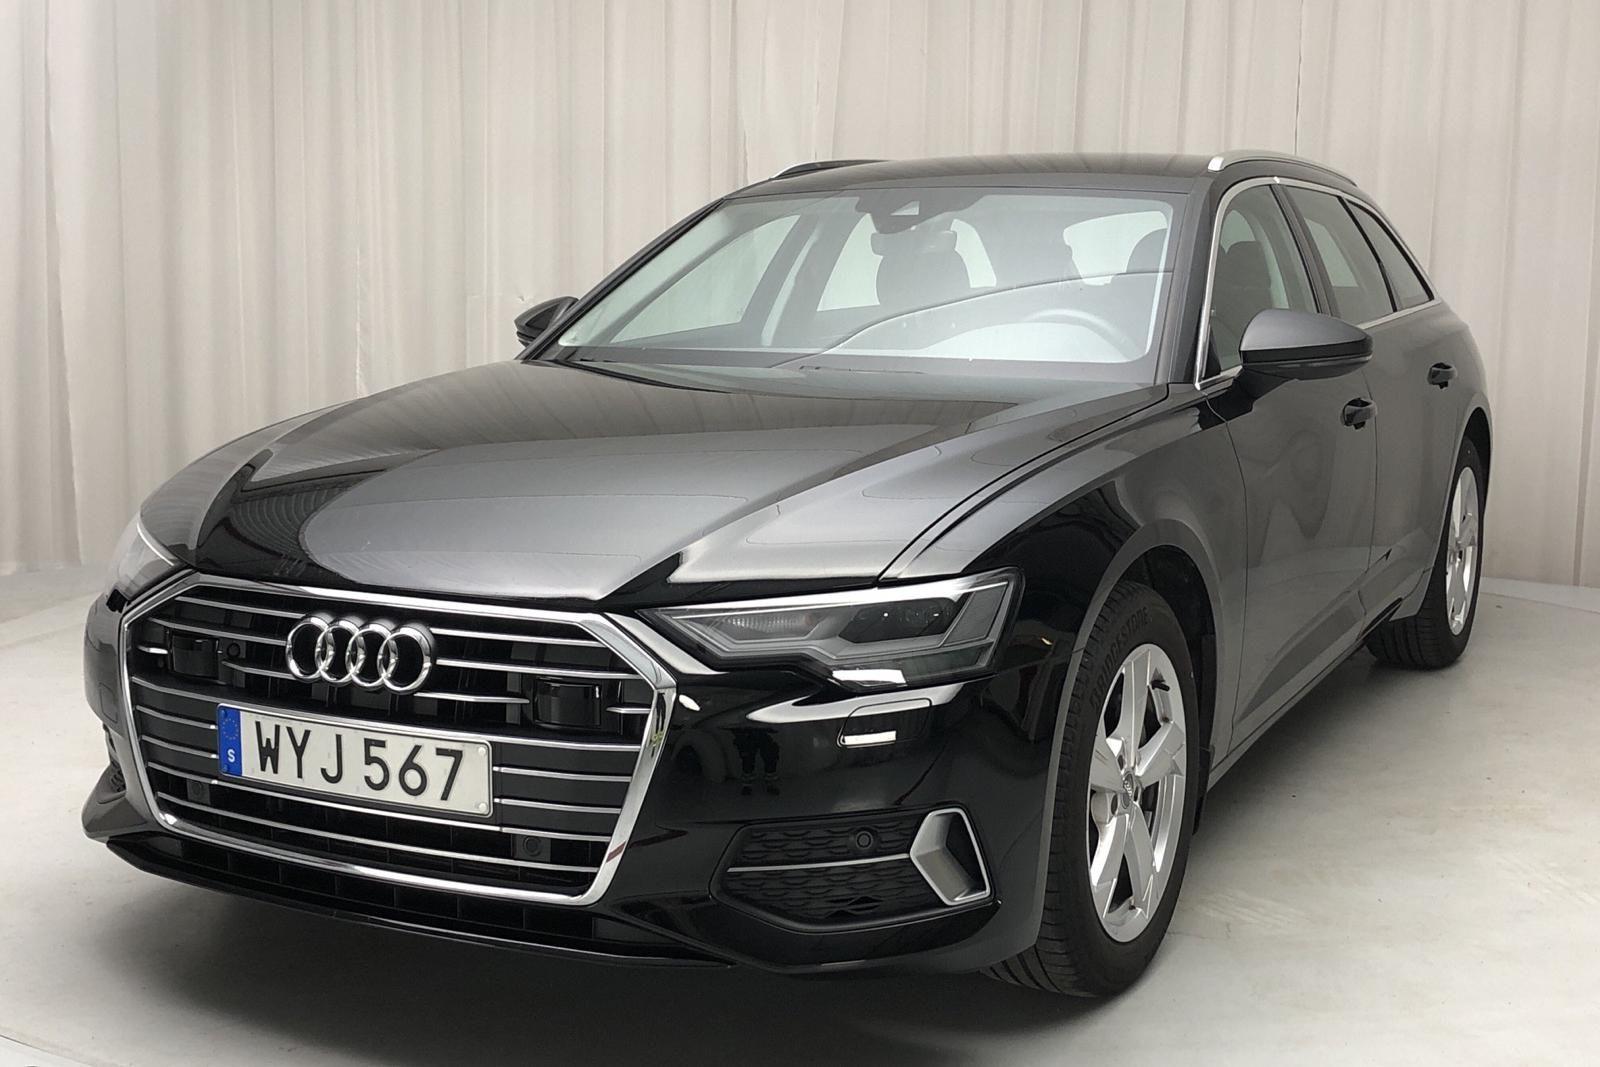 Audi A6 Avant 40 TDI (204 PS)